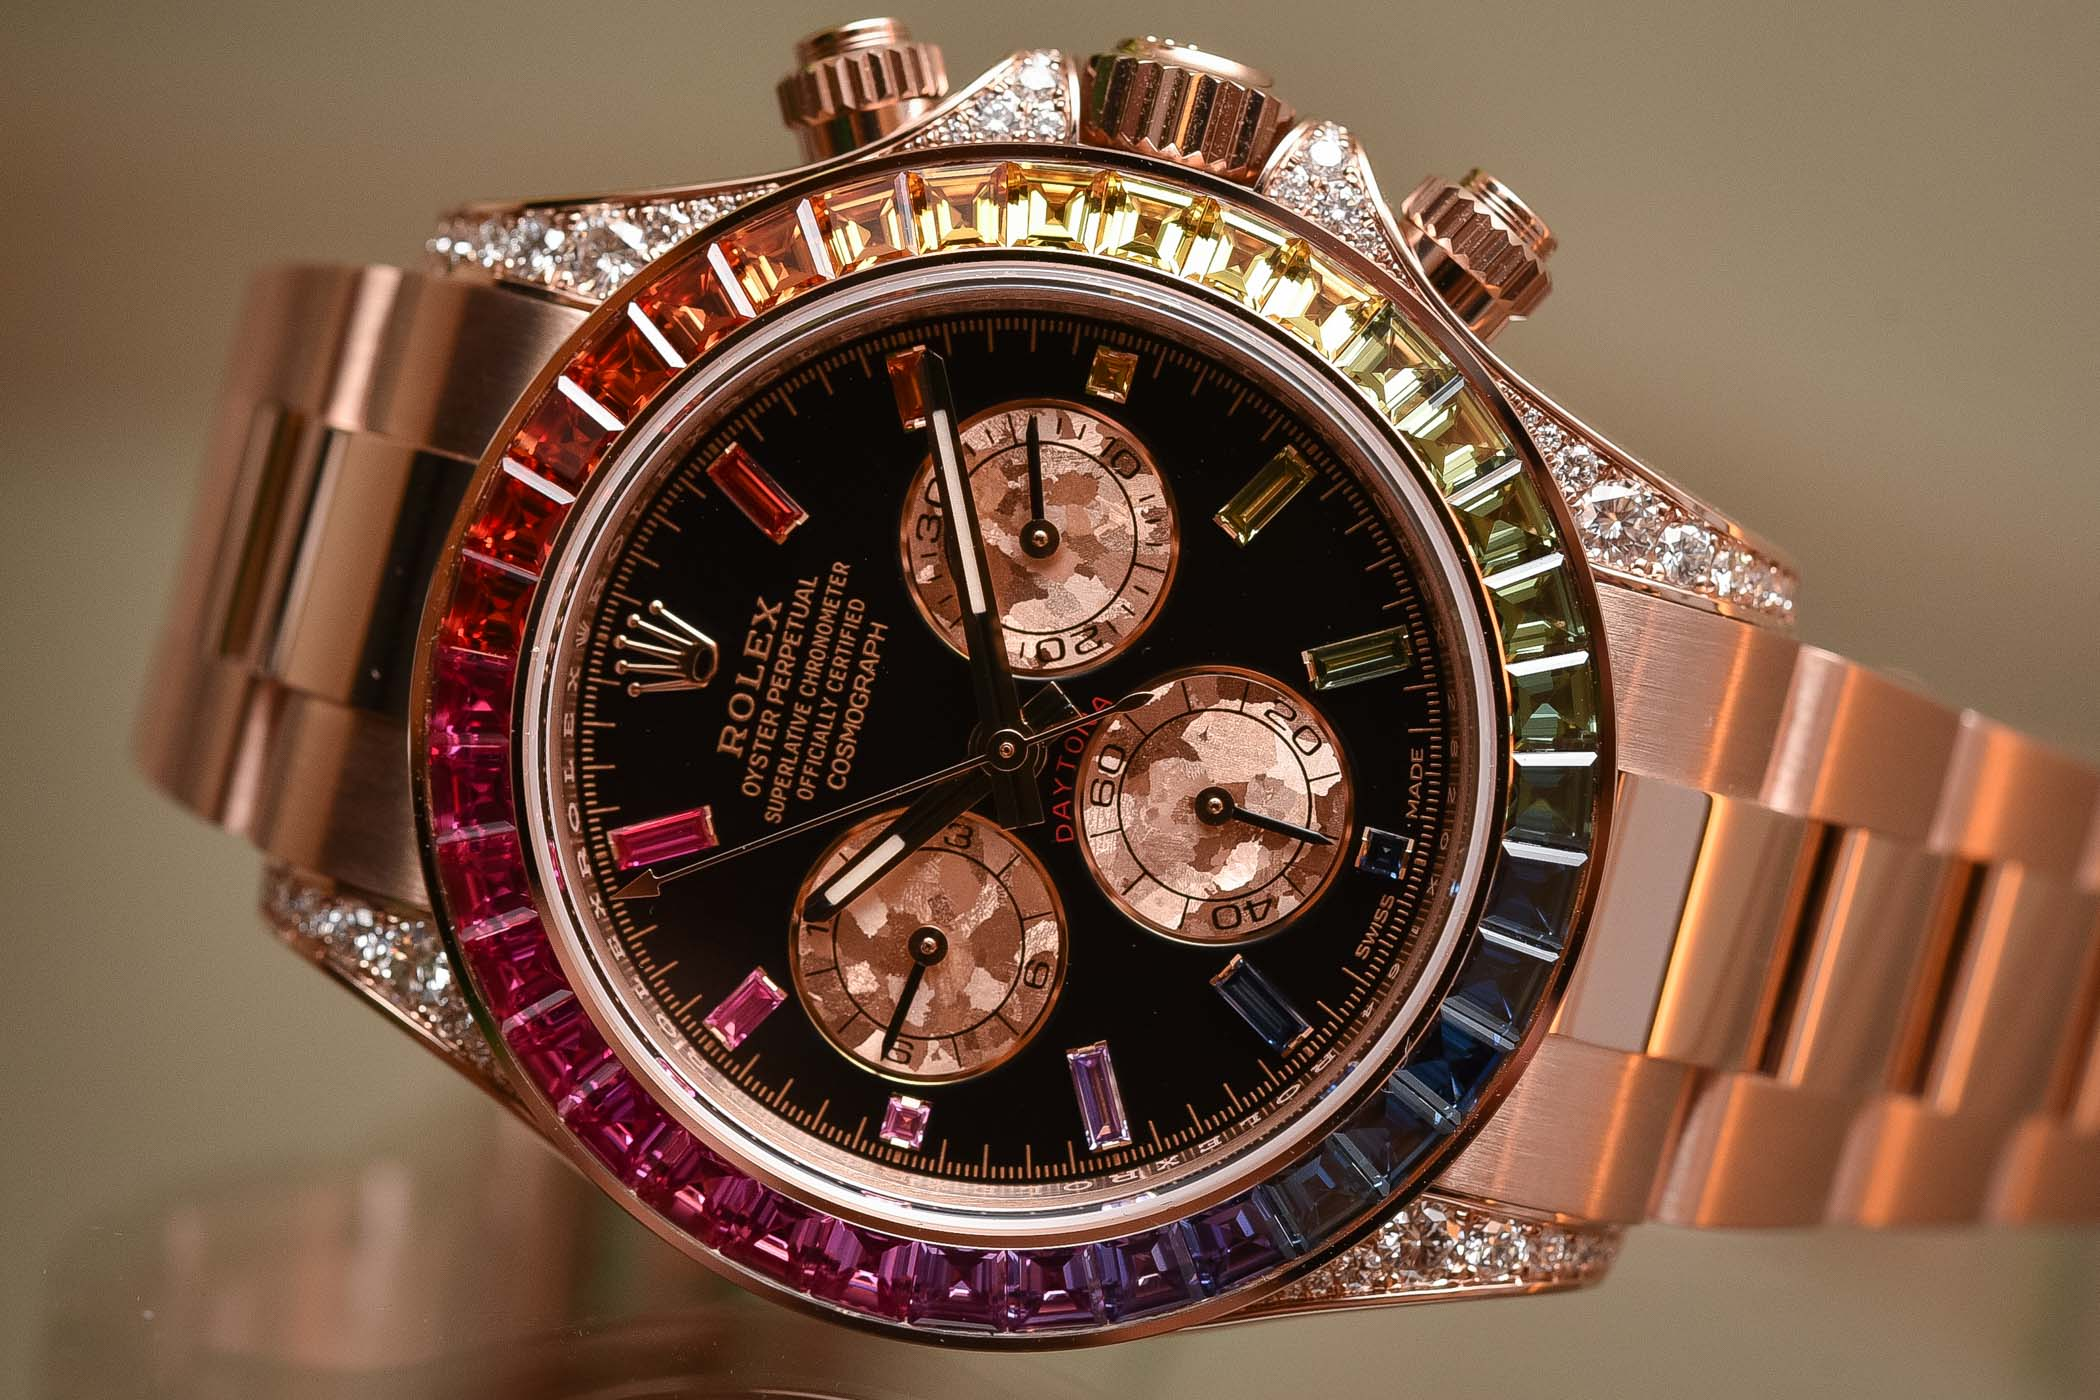 2018 Rolex Daytona Rainbow Everose Gold 116595RBOW